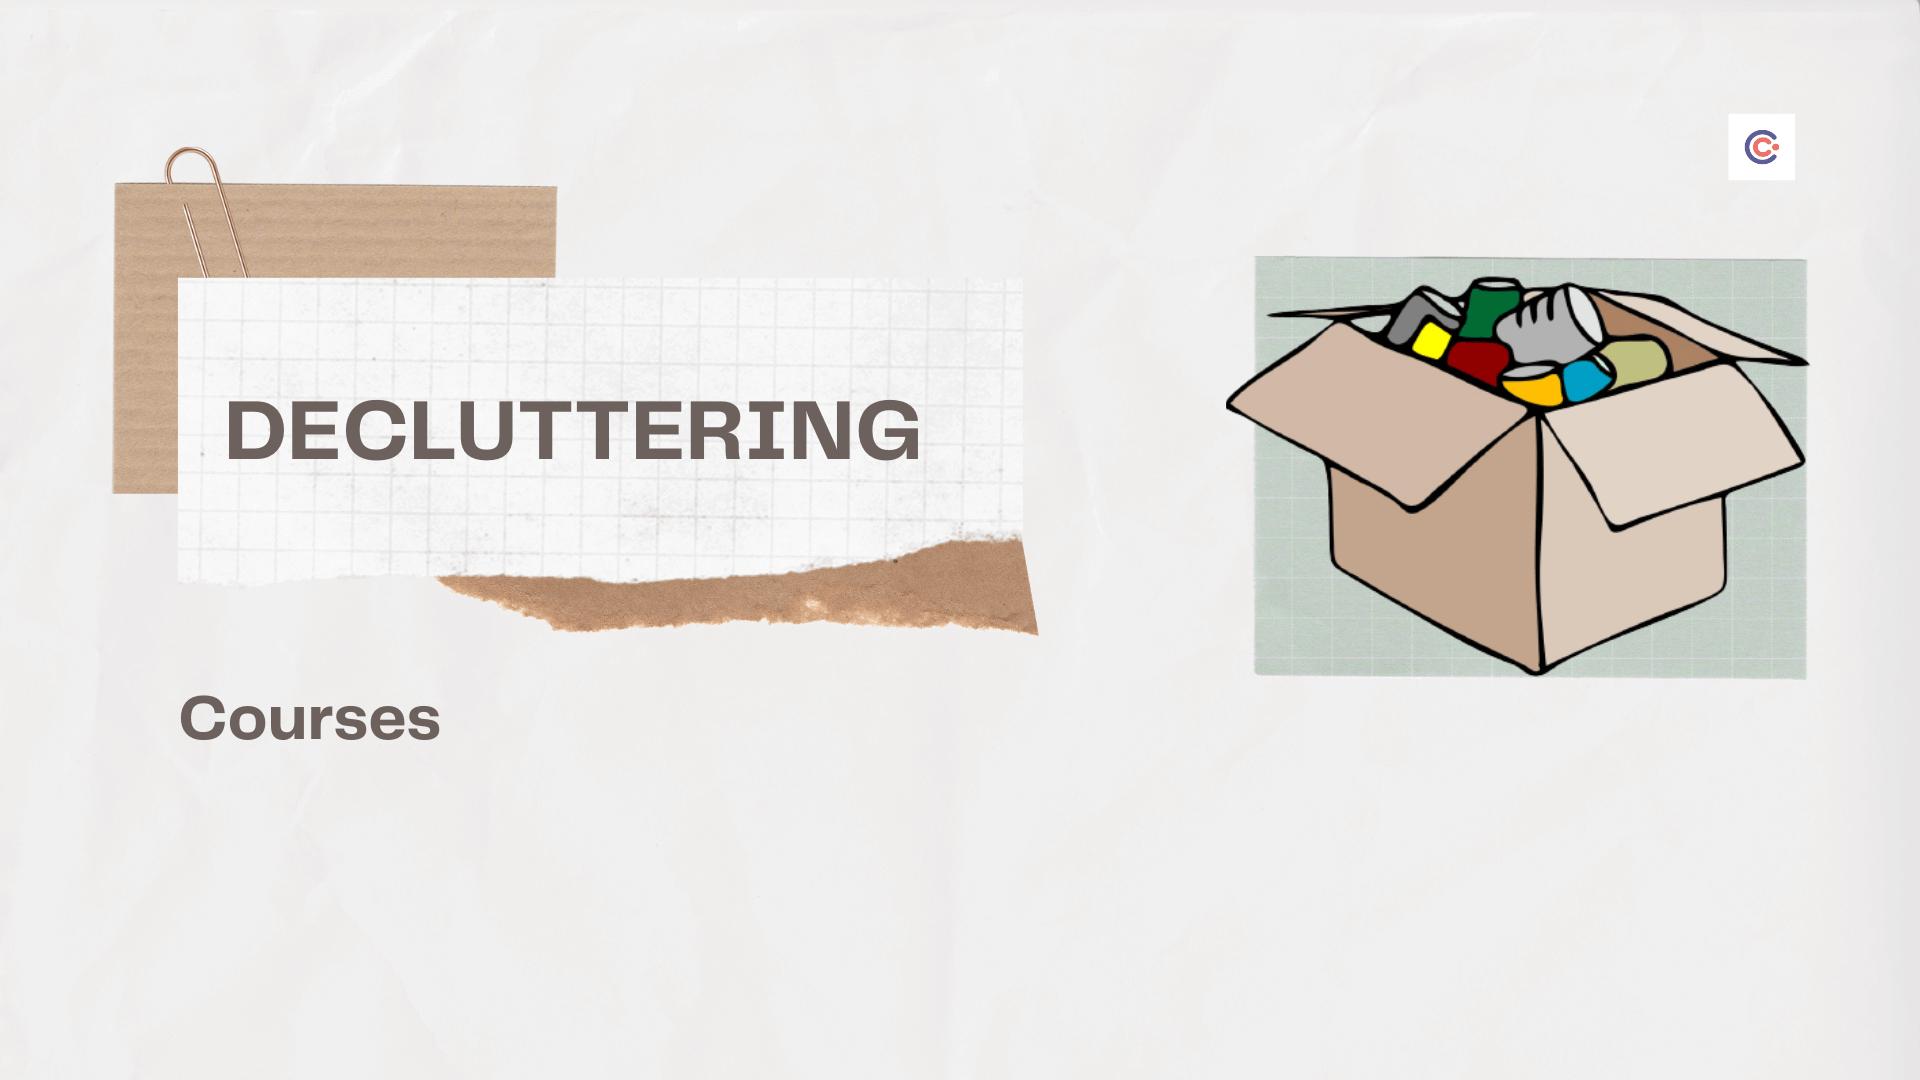 5 Best Decluttering Courses & Classes - Learn Decluttering Online